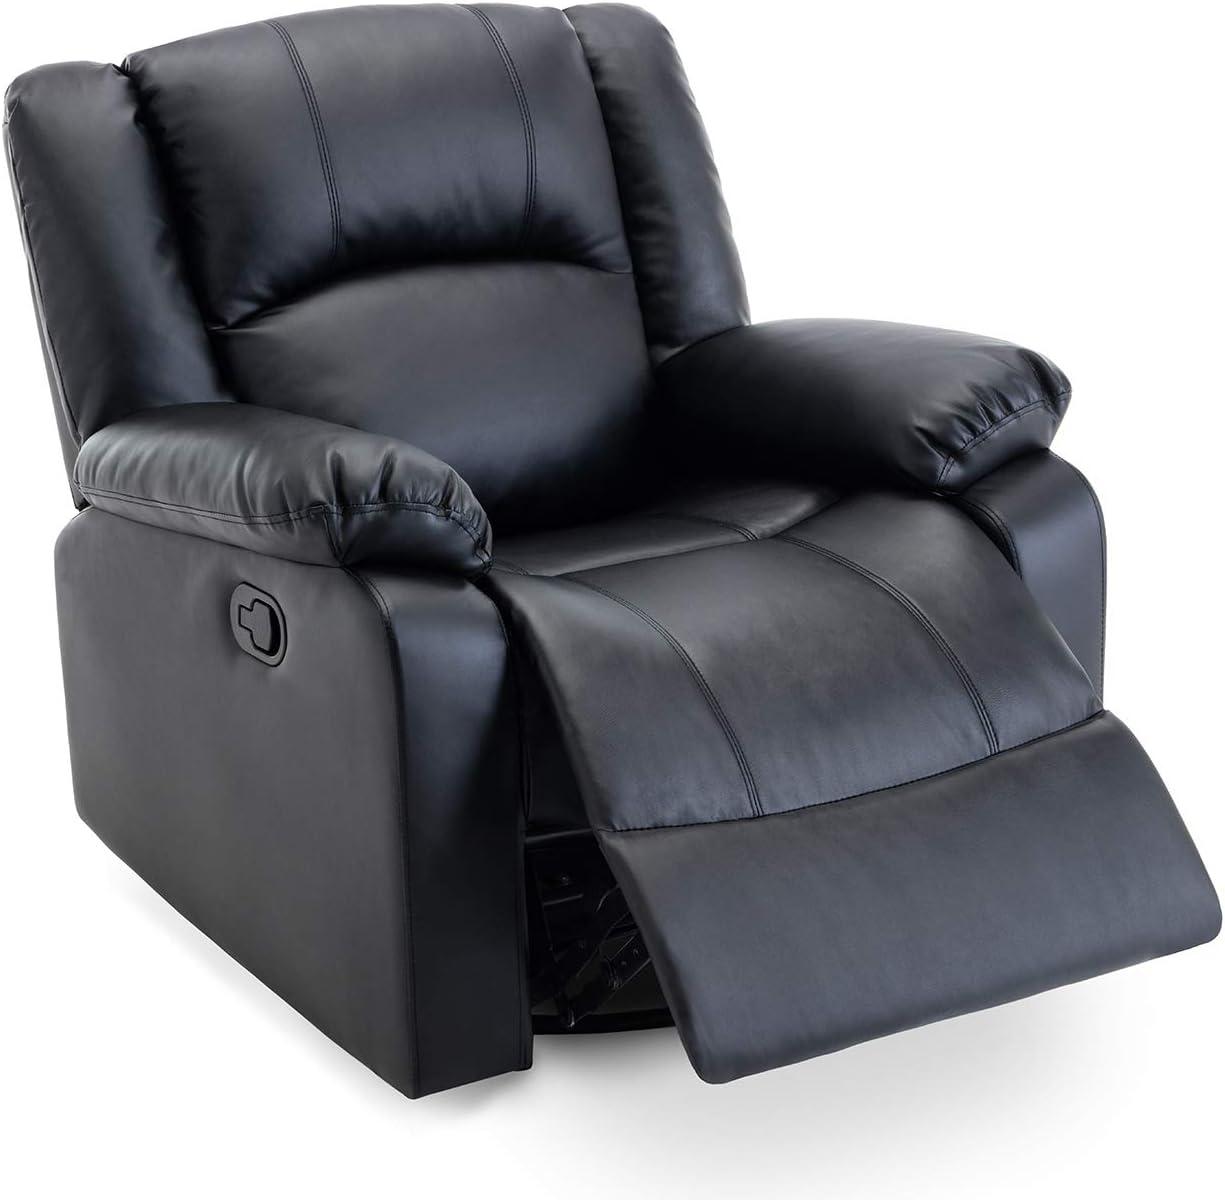 Belleze Swivel Glider Faux Leather Rocker Recliner Chair Overstuffed Armrest Backrest, Black